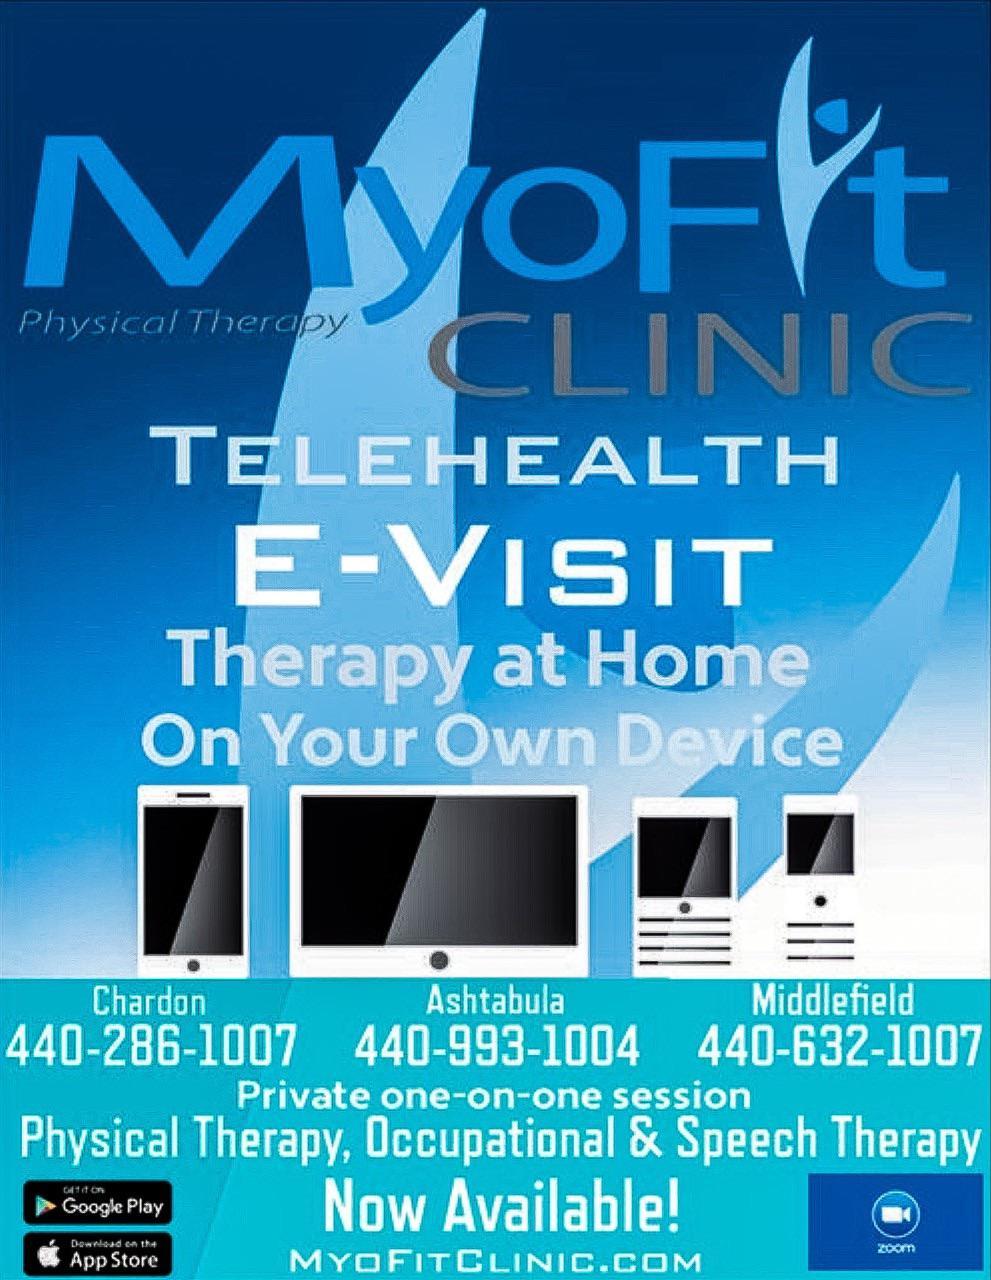 MyoFit Clinic - Ashtabula